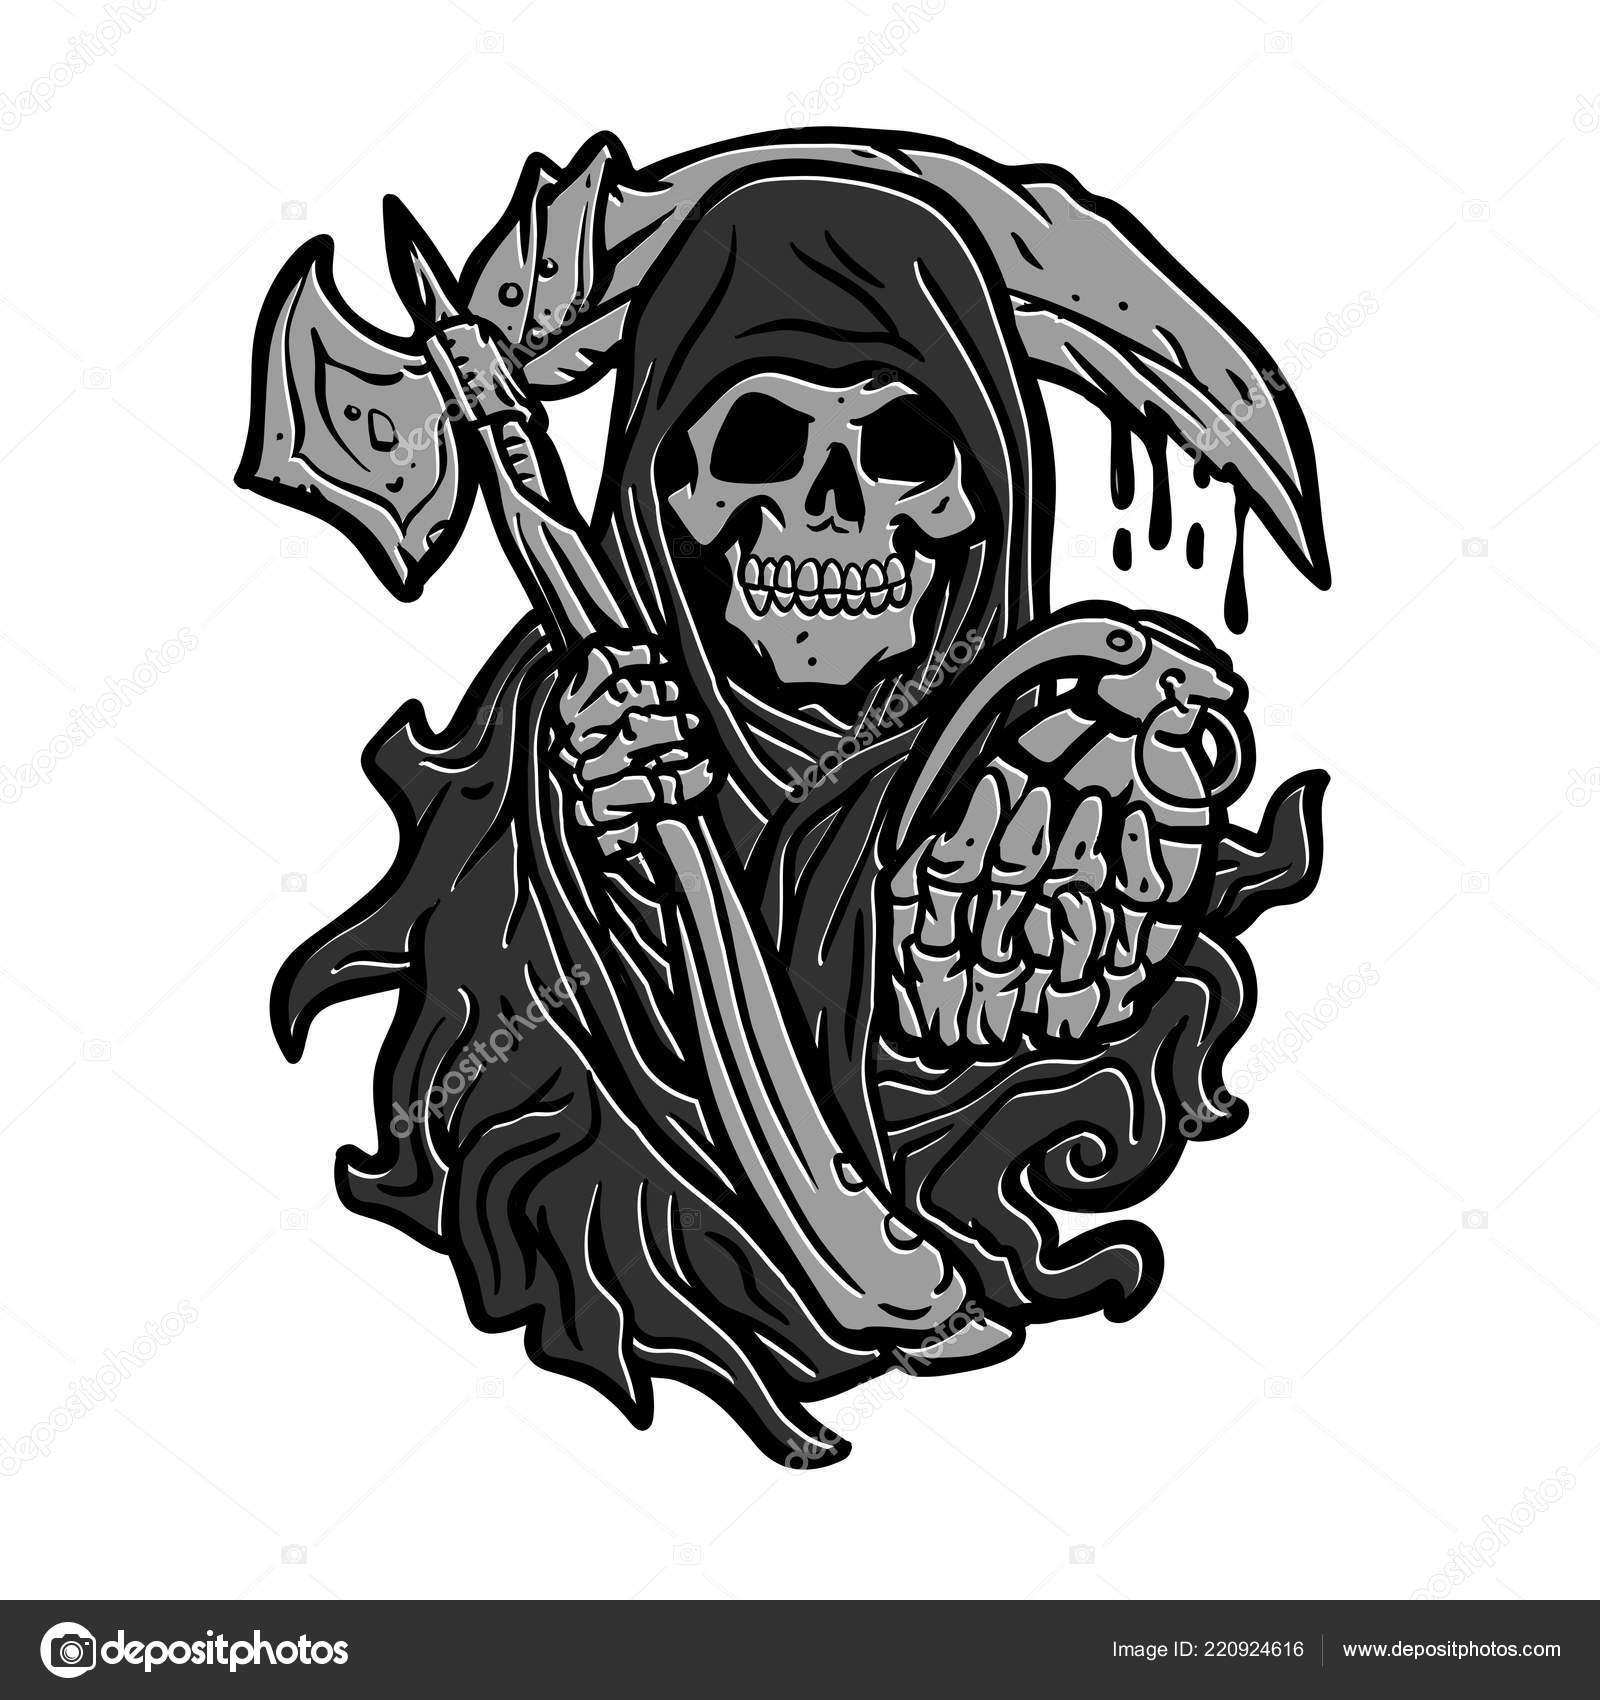 Skull Grim Reaper Sickle Grenade — Stock Photo © Milesthone